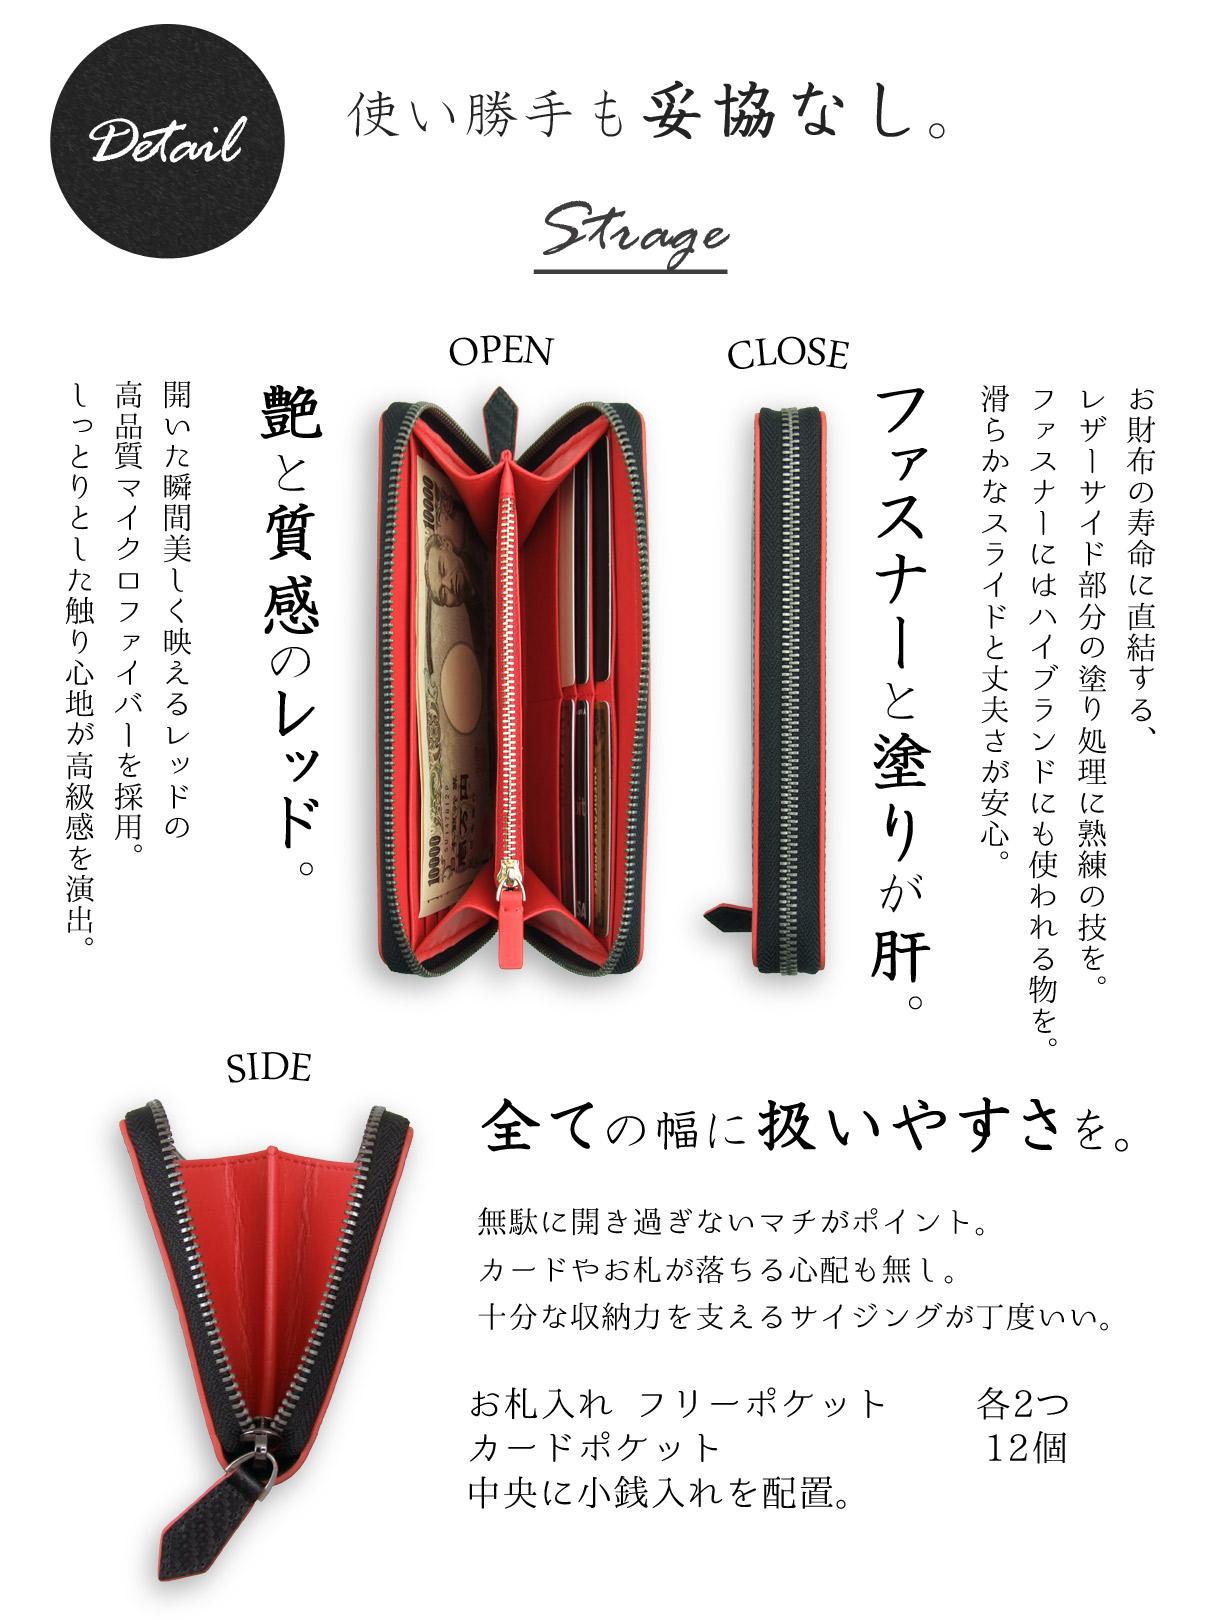 Dom Teporna 牛革 長財布 カーボンレザー ラウンドファスナー ウォレット サイフ 全3色